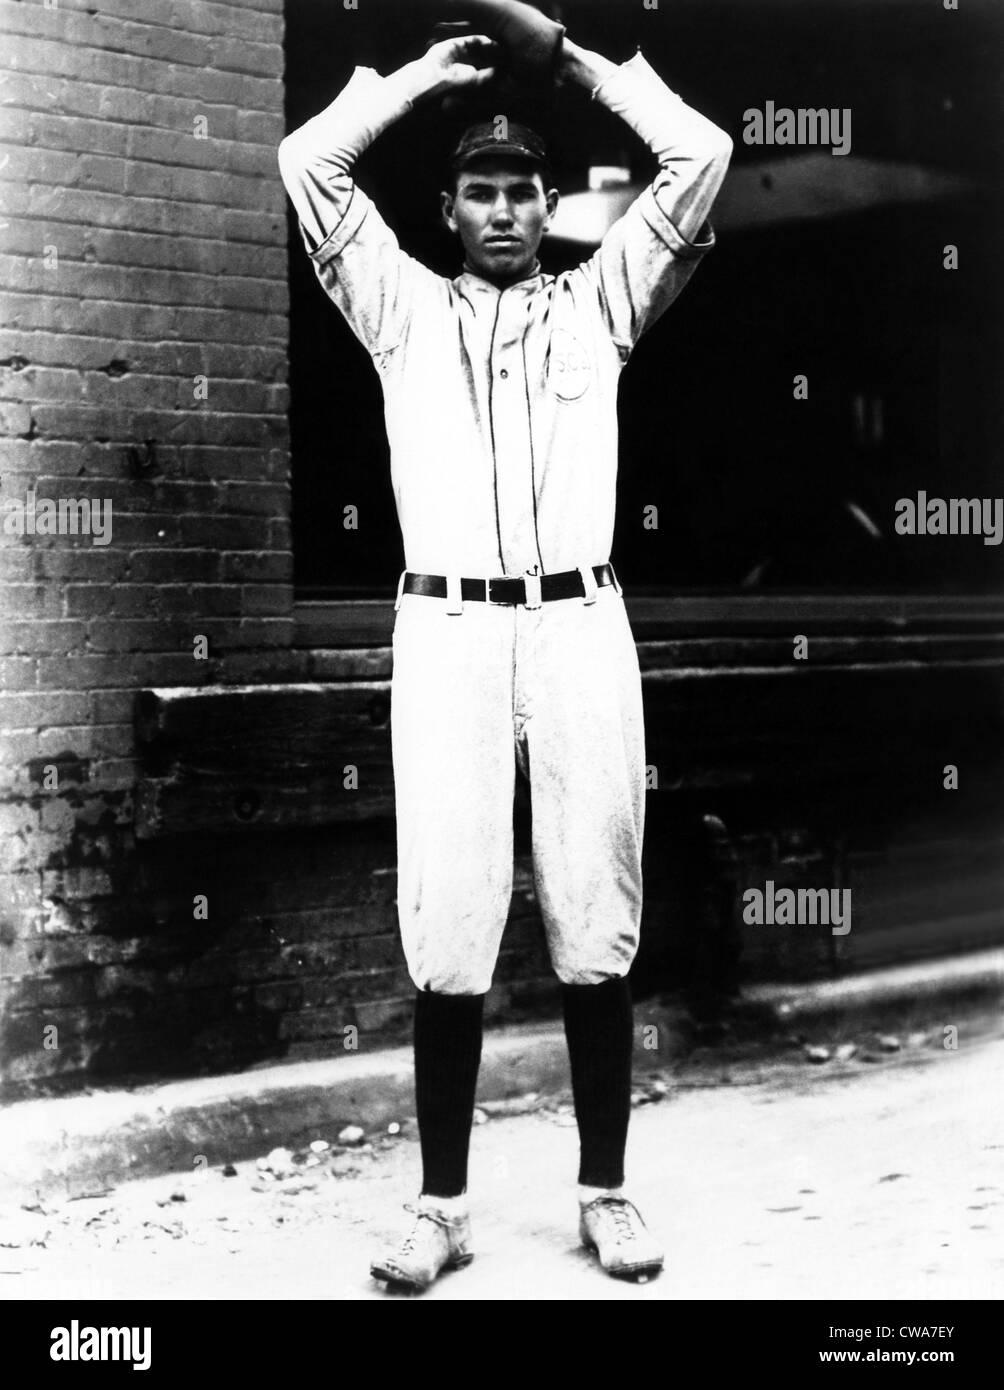 Jay Hanna 'Dizzy' Dean, early 1920s. Courtesy: CSU Archives/Everett Collection - Stock Image